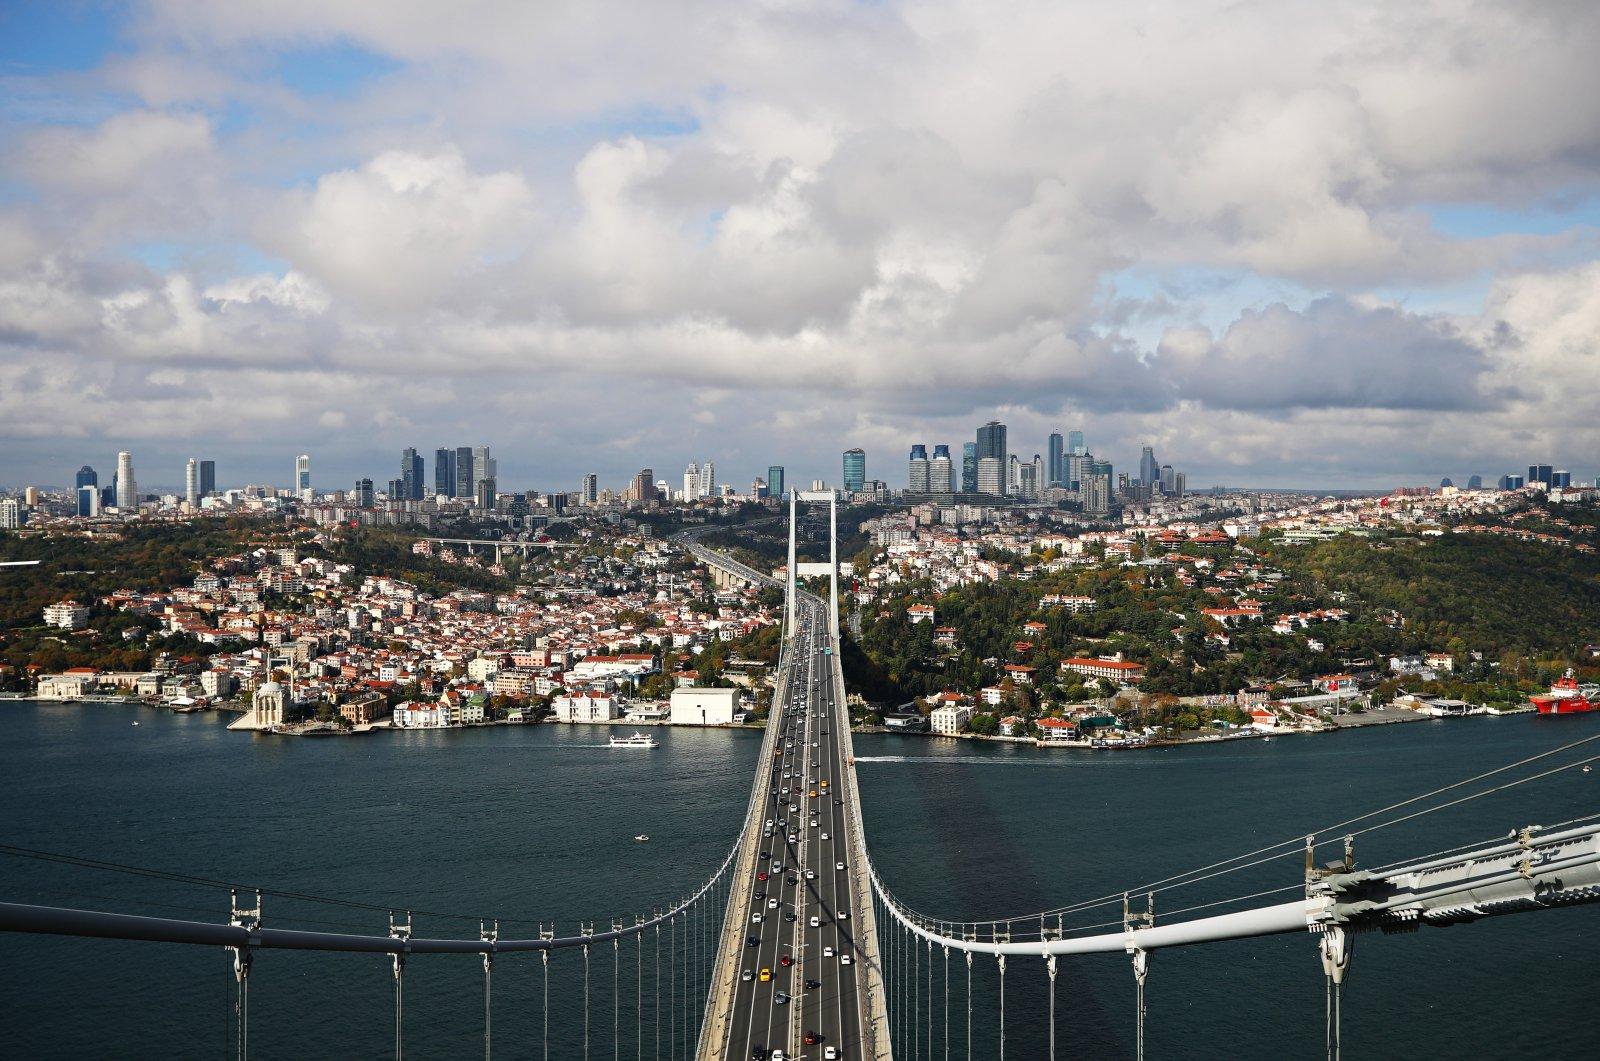 The 15 July Martyrs Bridge over the Bosporus, Istanbul, Turkey, Nov. 11, 2020. (Getty Images)